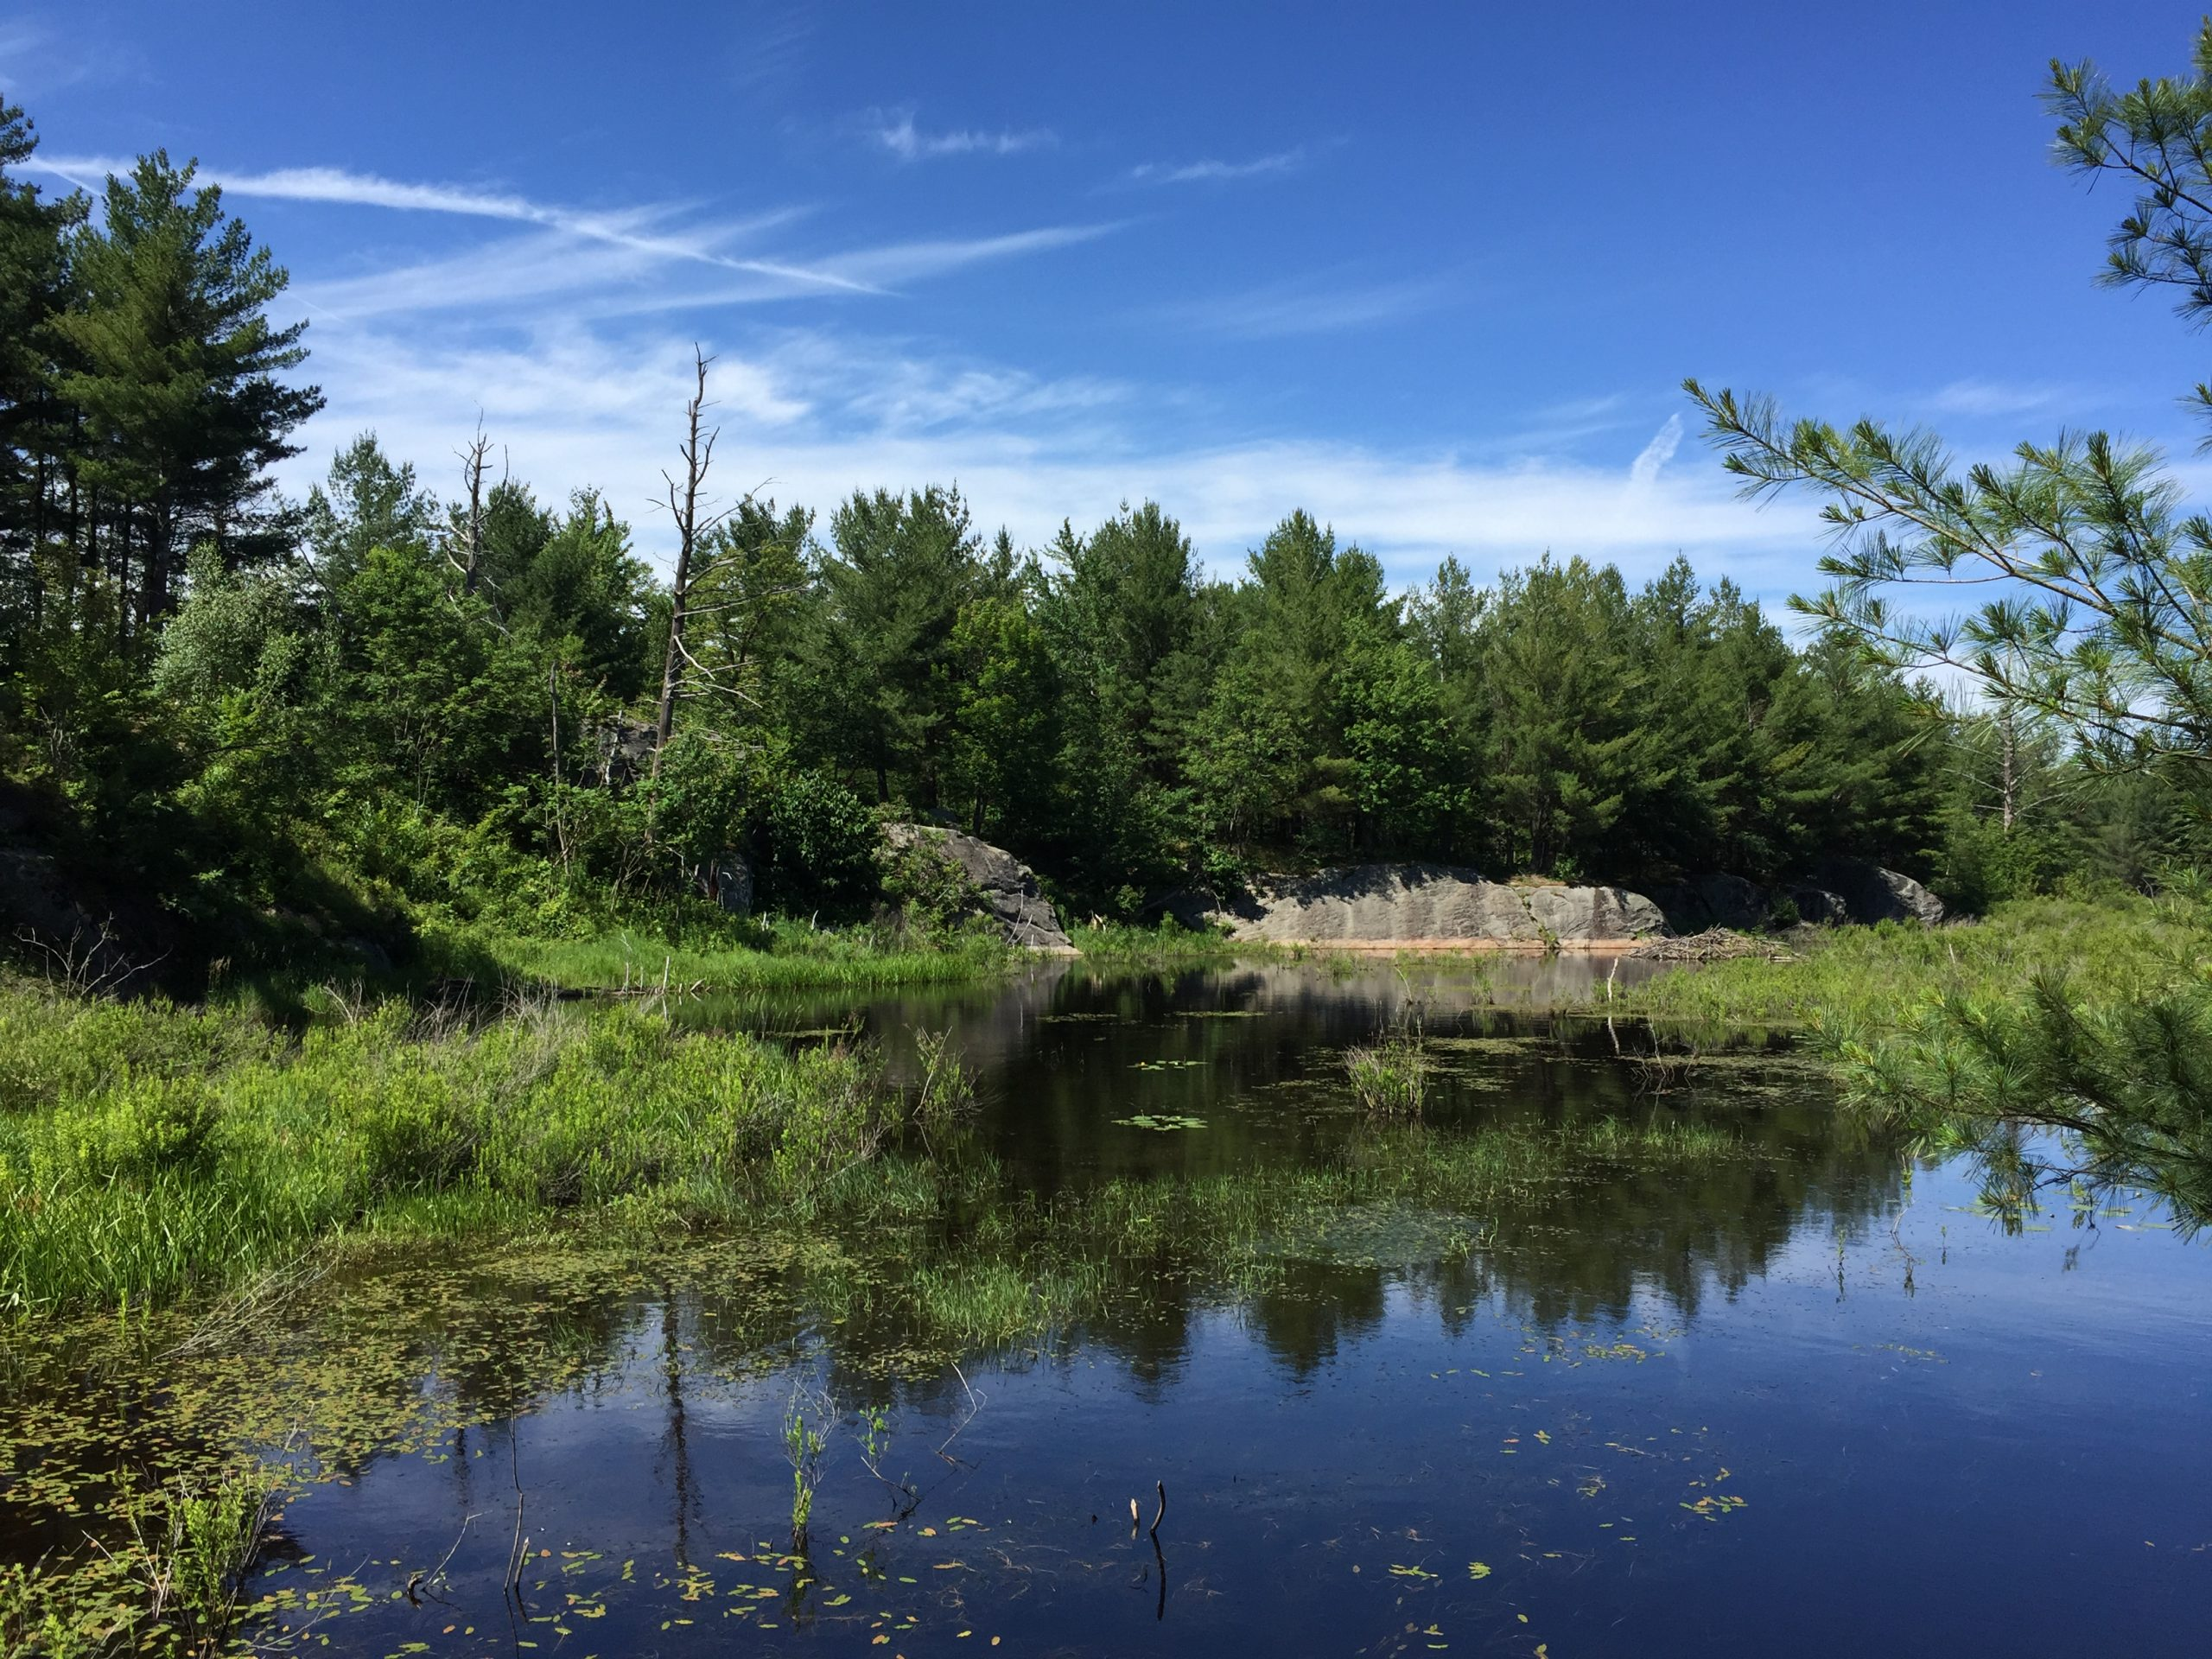 Copperhead Consulting, Kentucky Environmental Regulation Services